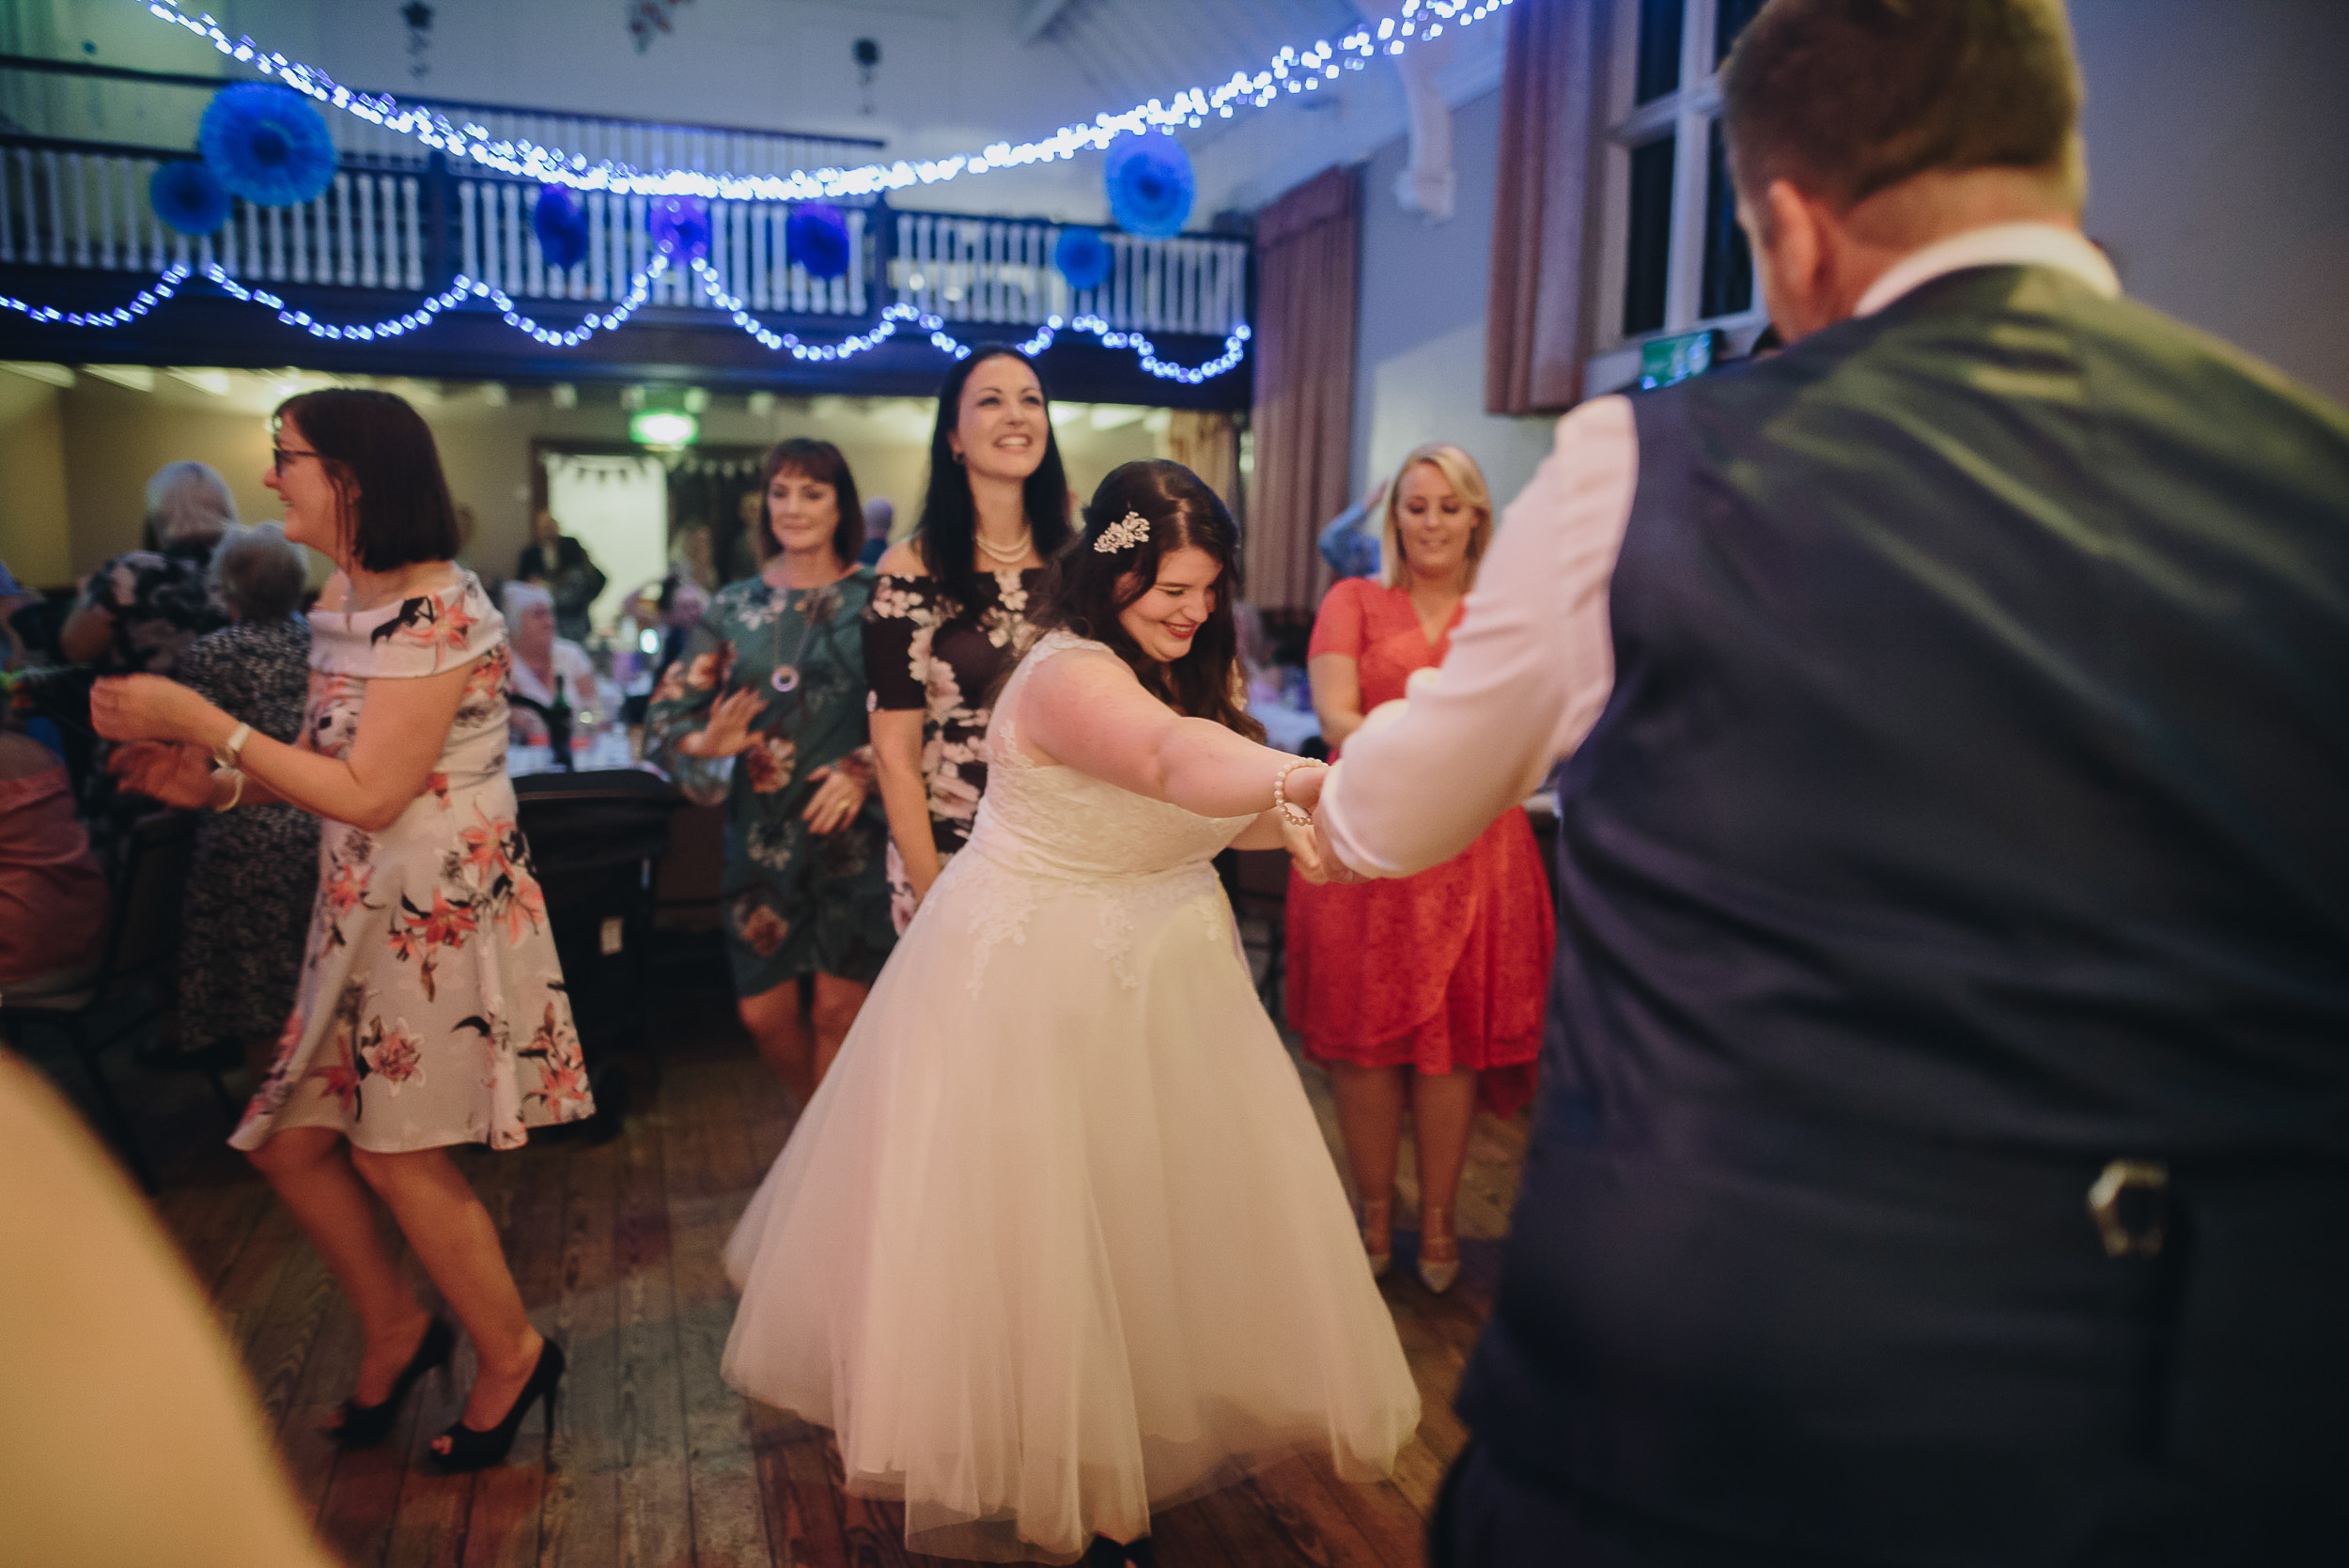 Smithills-hall-wedding-manchester-the-barlow-edgworth-hadfield-133.jpg